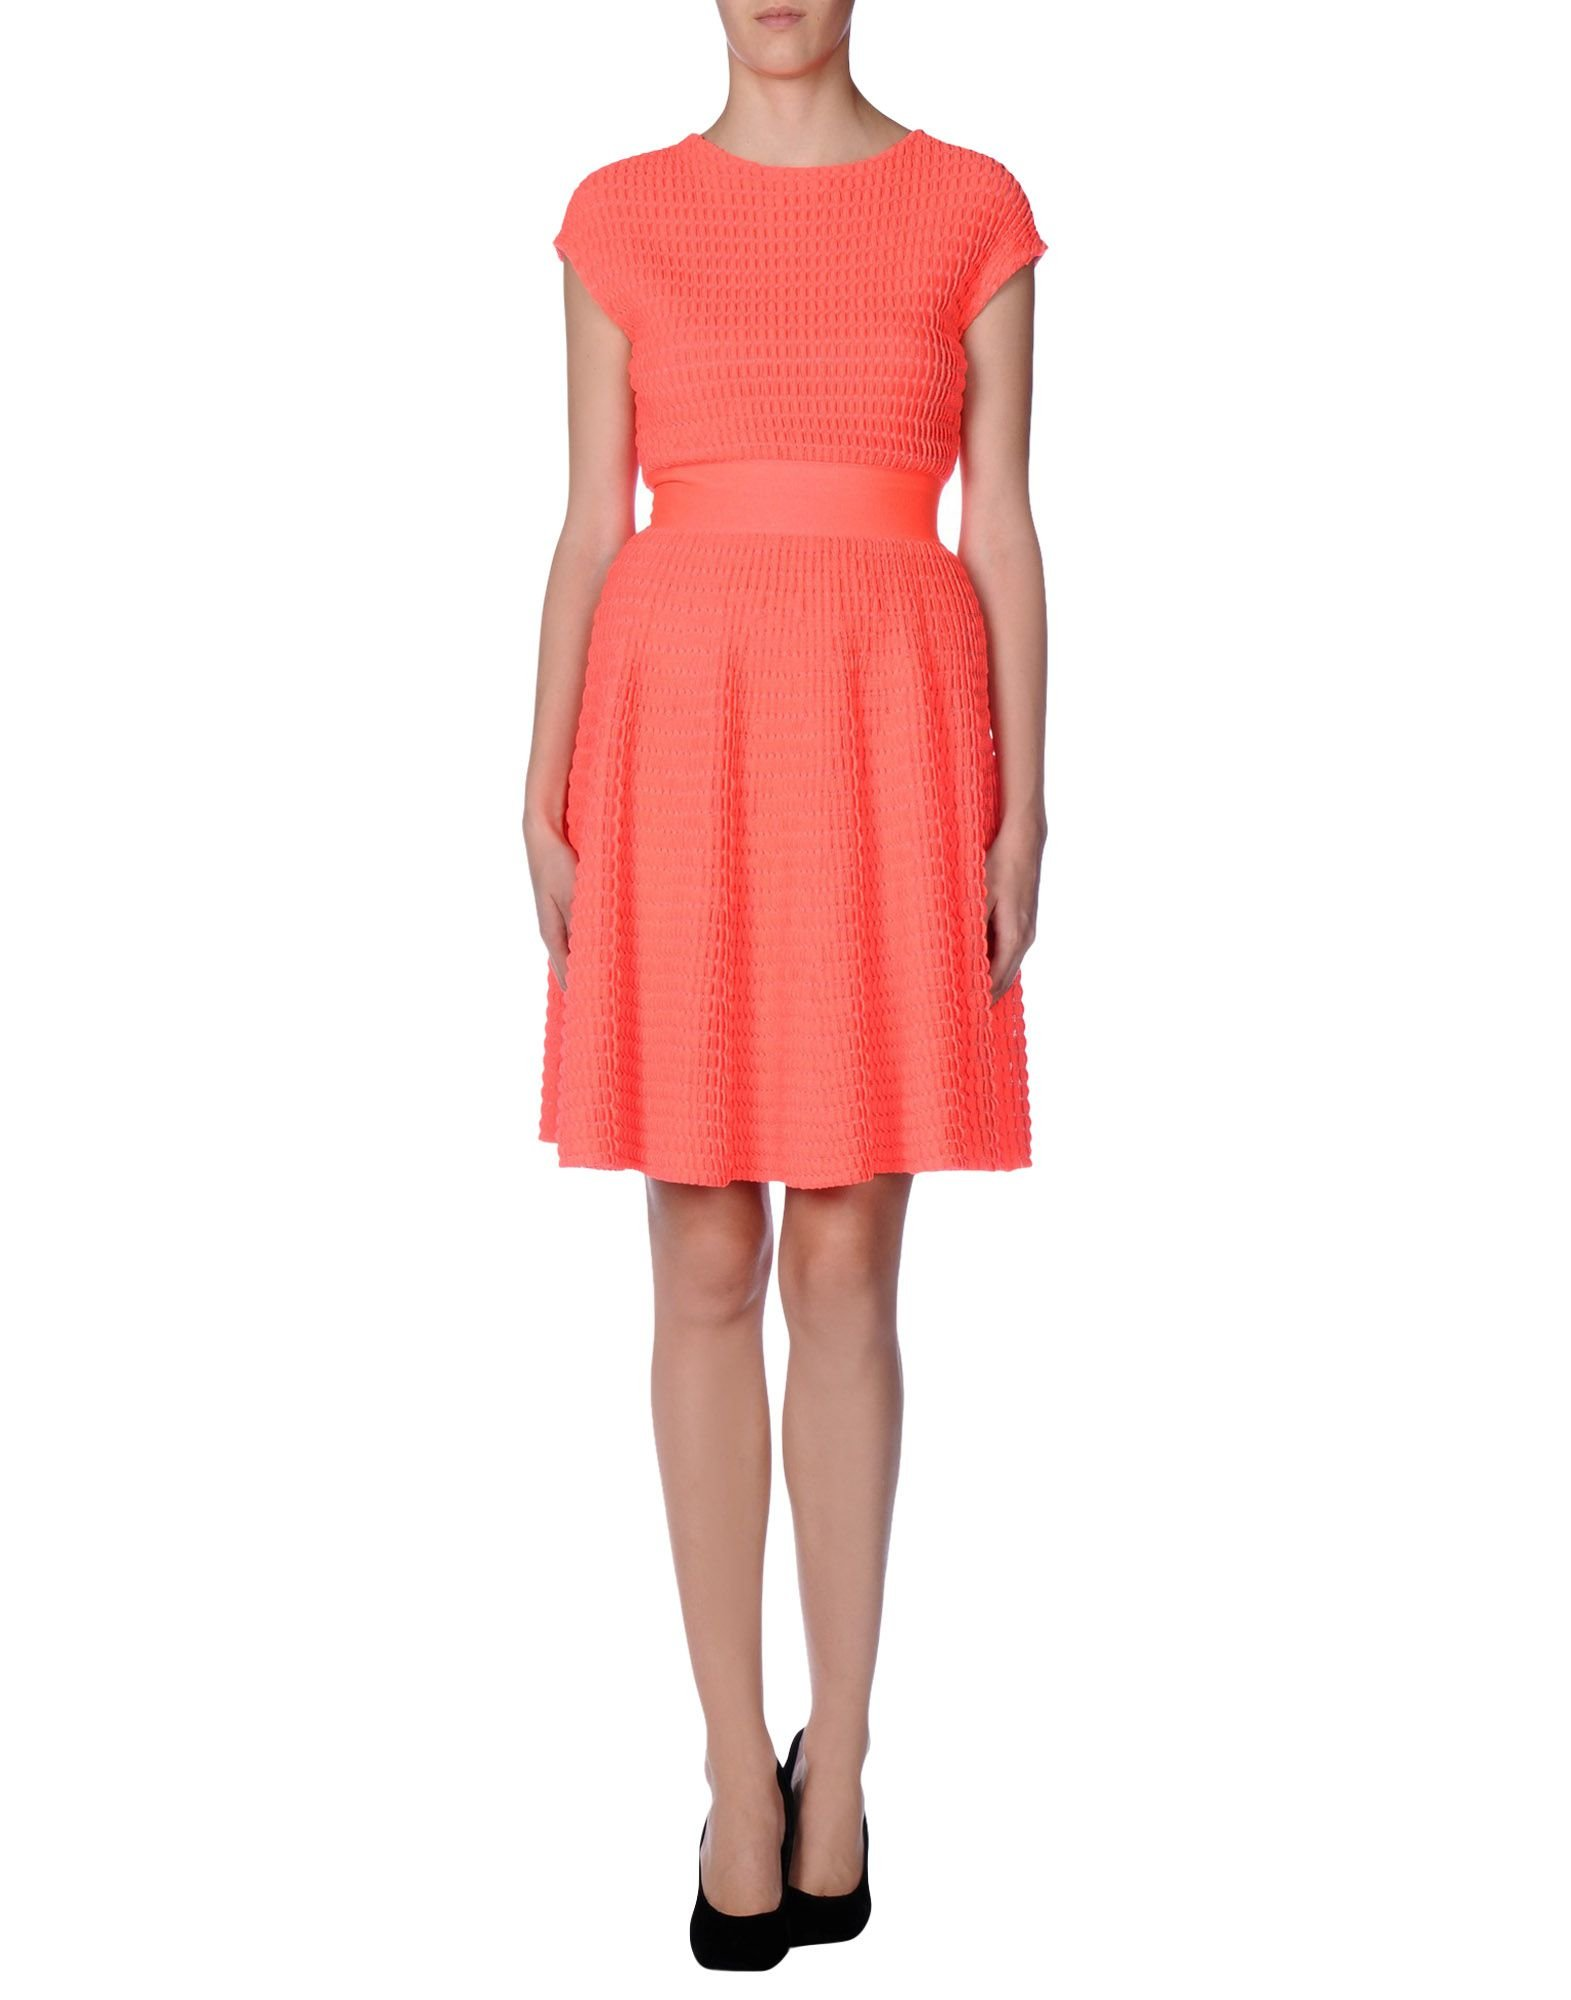 dior short dresses - photo #24